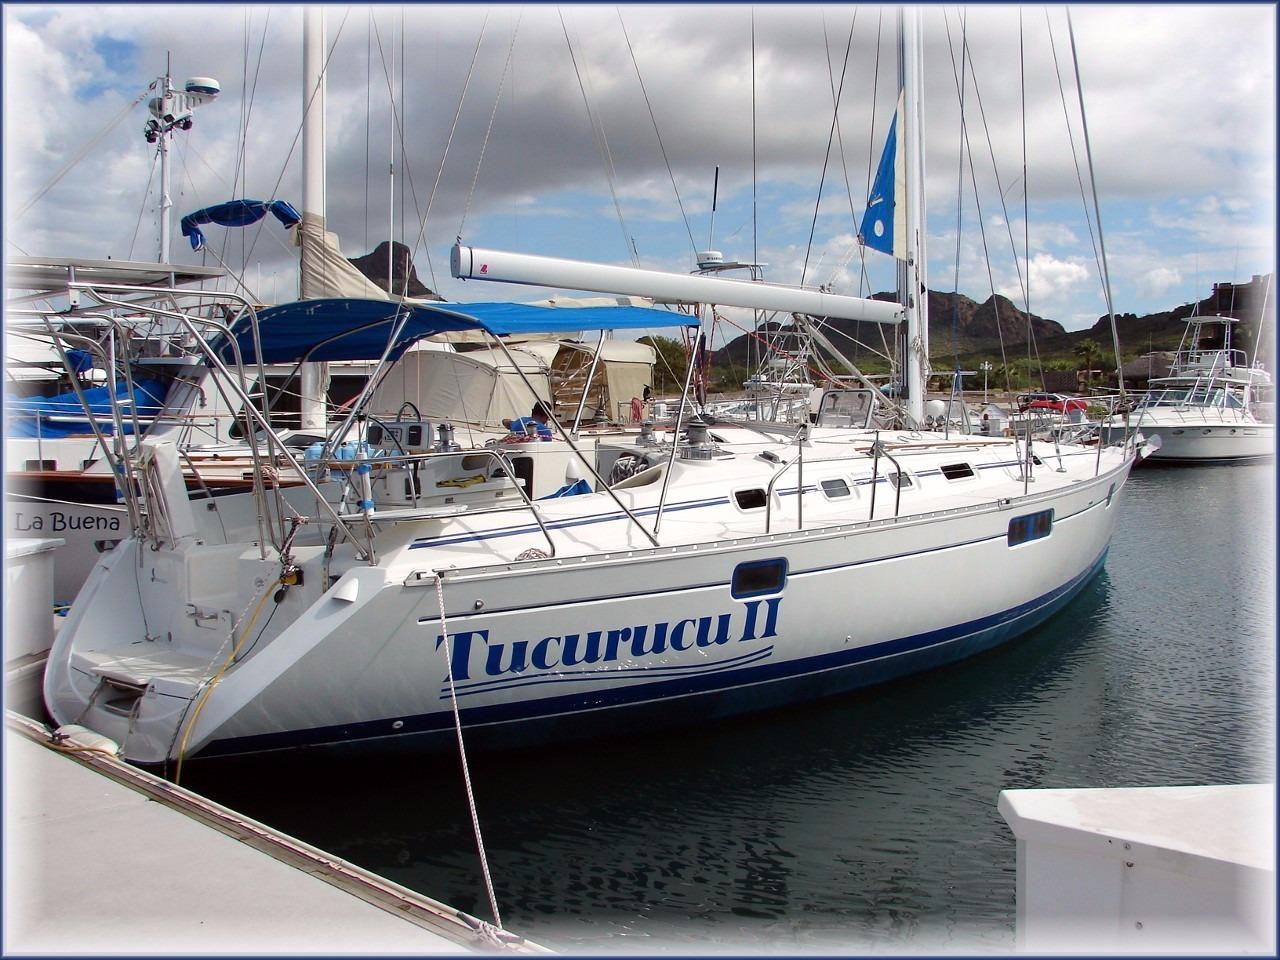 44' Beneteau Oceanis 440 Aft Cockpit Sloop+Boat for sale!